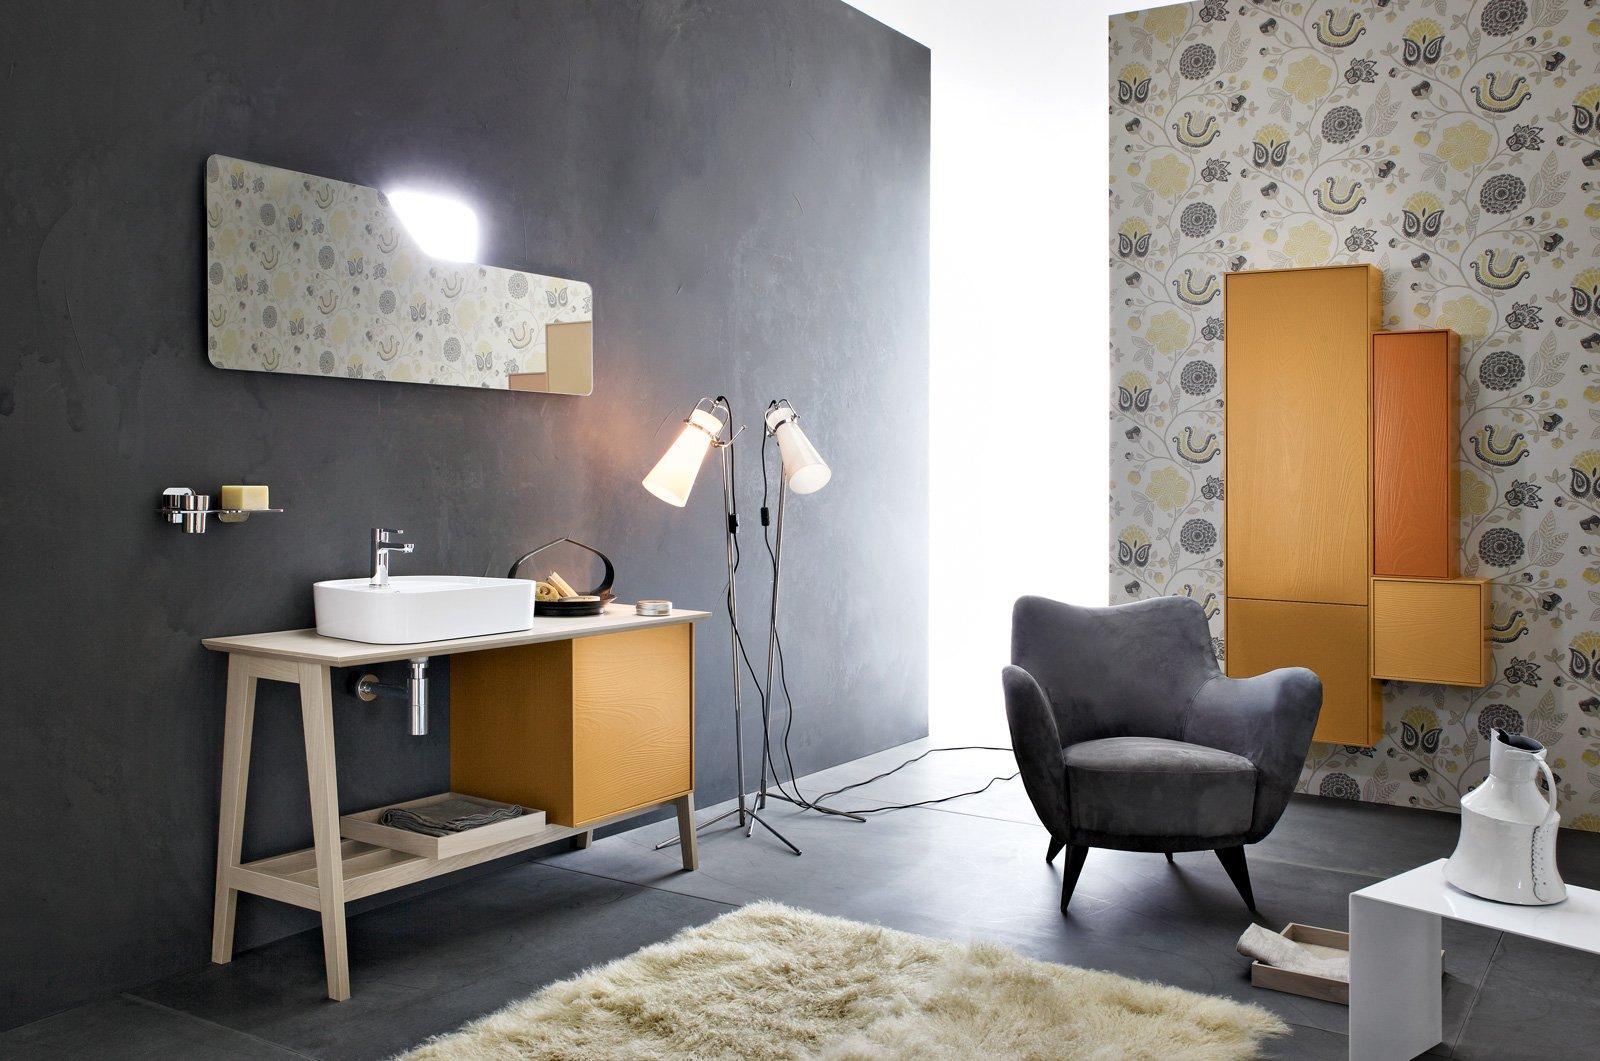 cersaie 2015 i nuovi mobili per l 39 arredobagno cose di casa. Black Bedroom Furniture Sets. Home Design Ideas